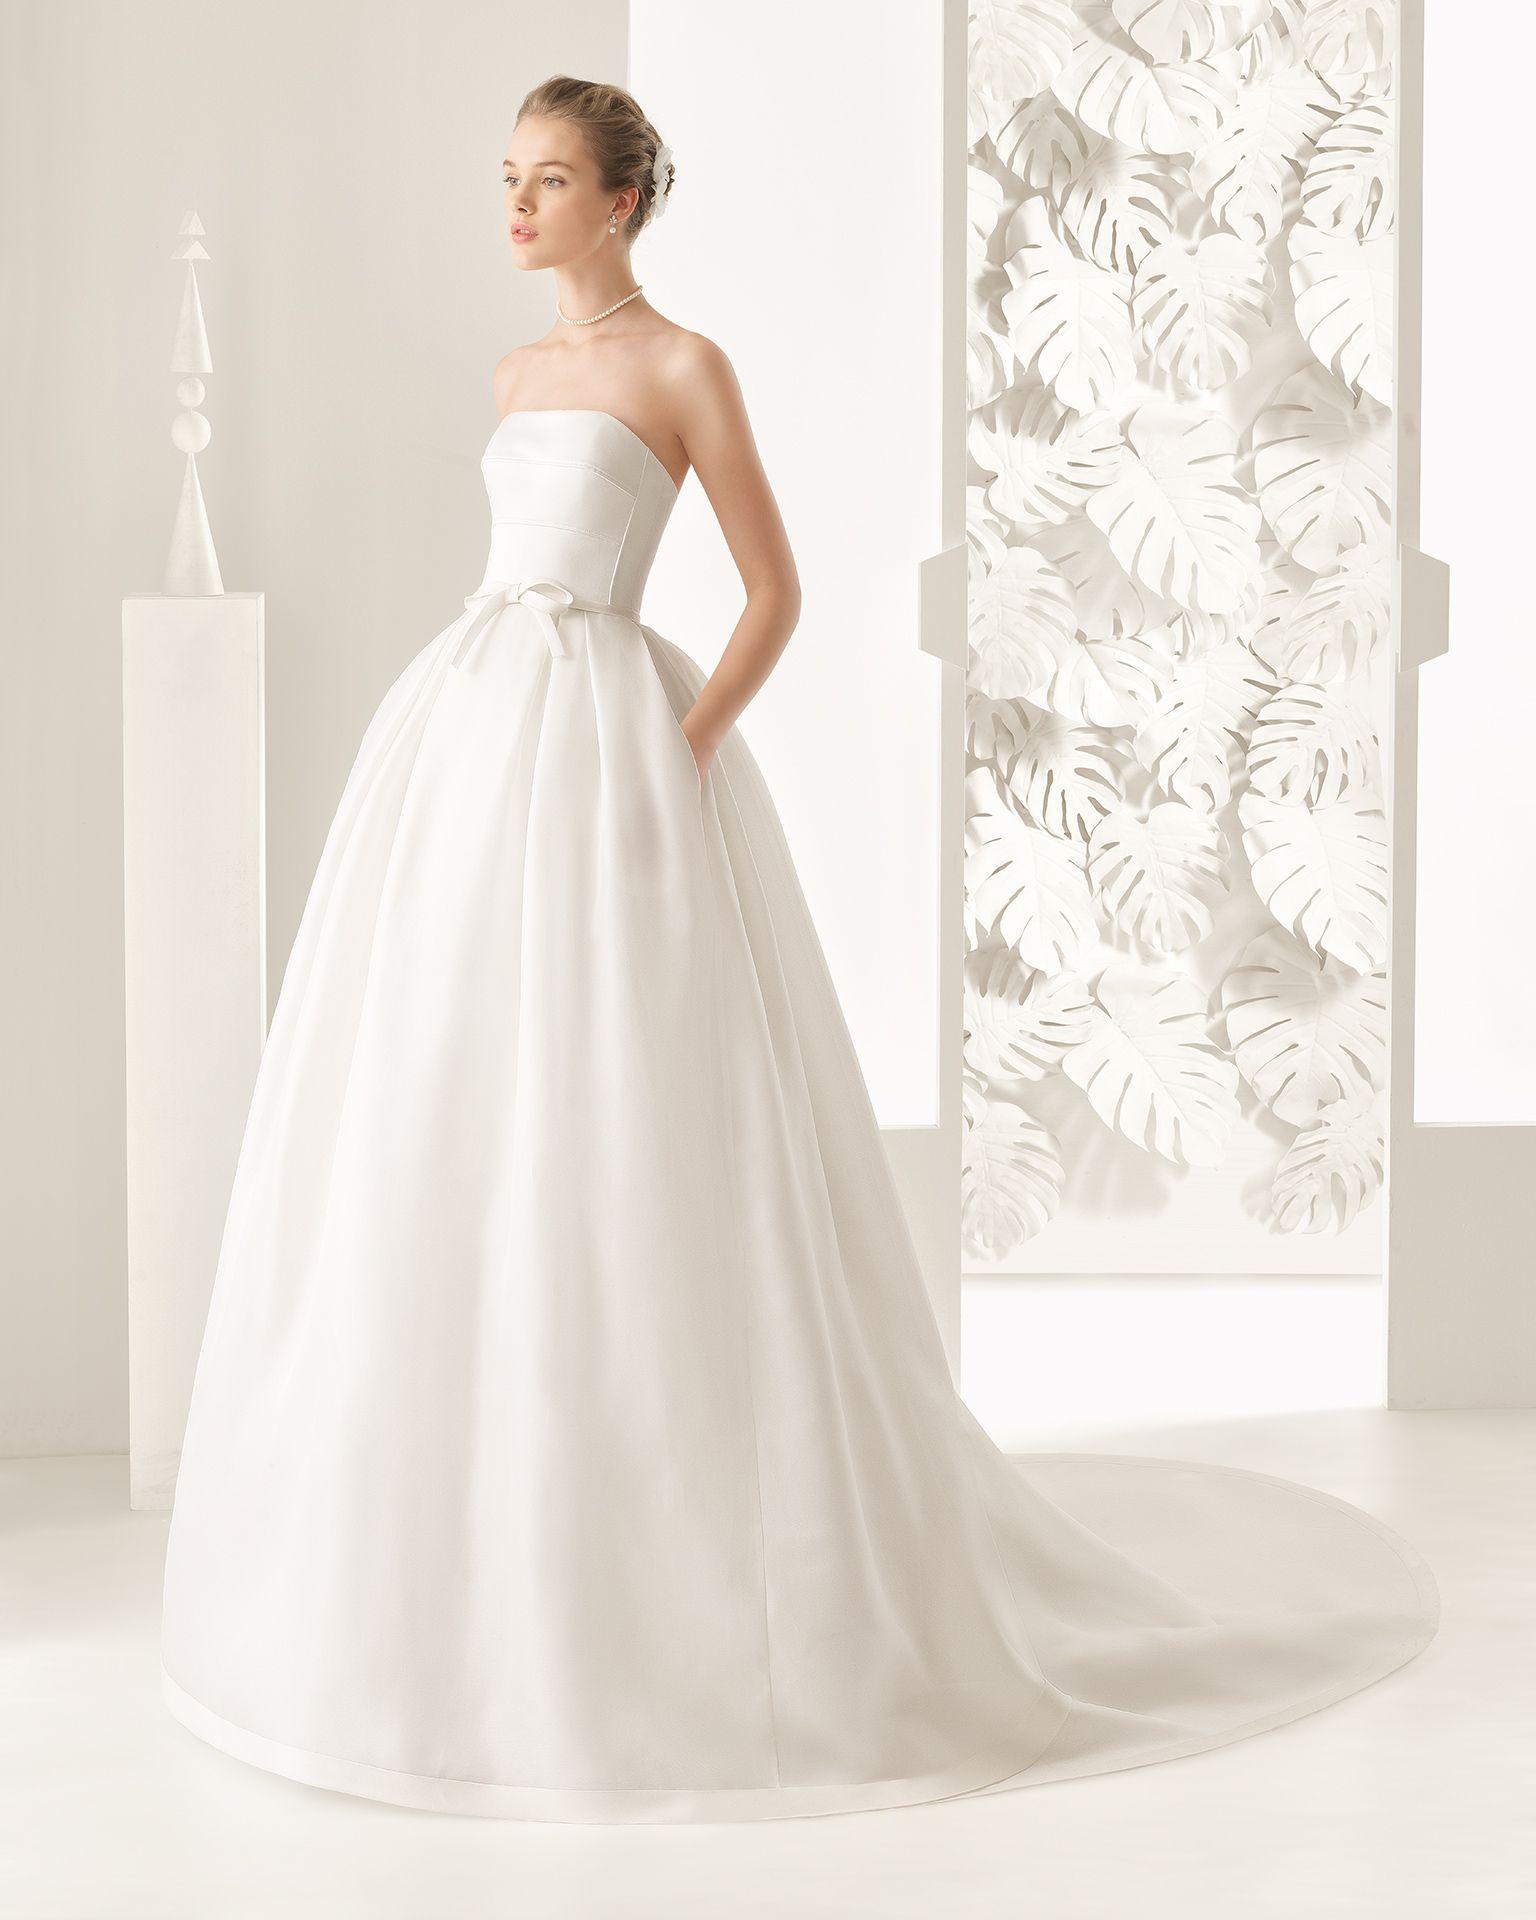 Nectar - 2017 Bridal Collection. Rosa Clará. | Rosa clará ...